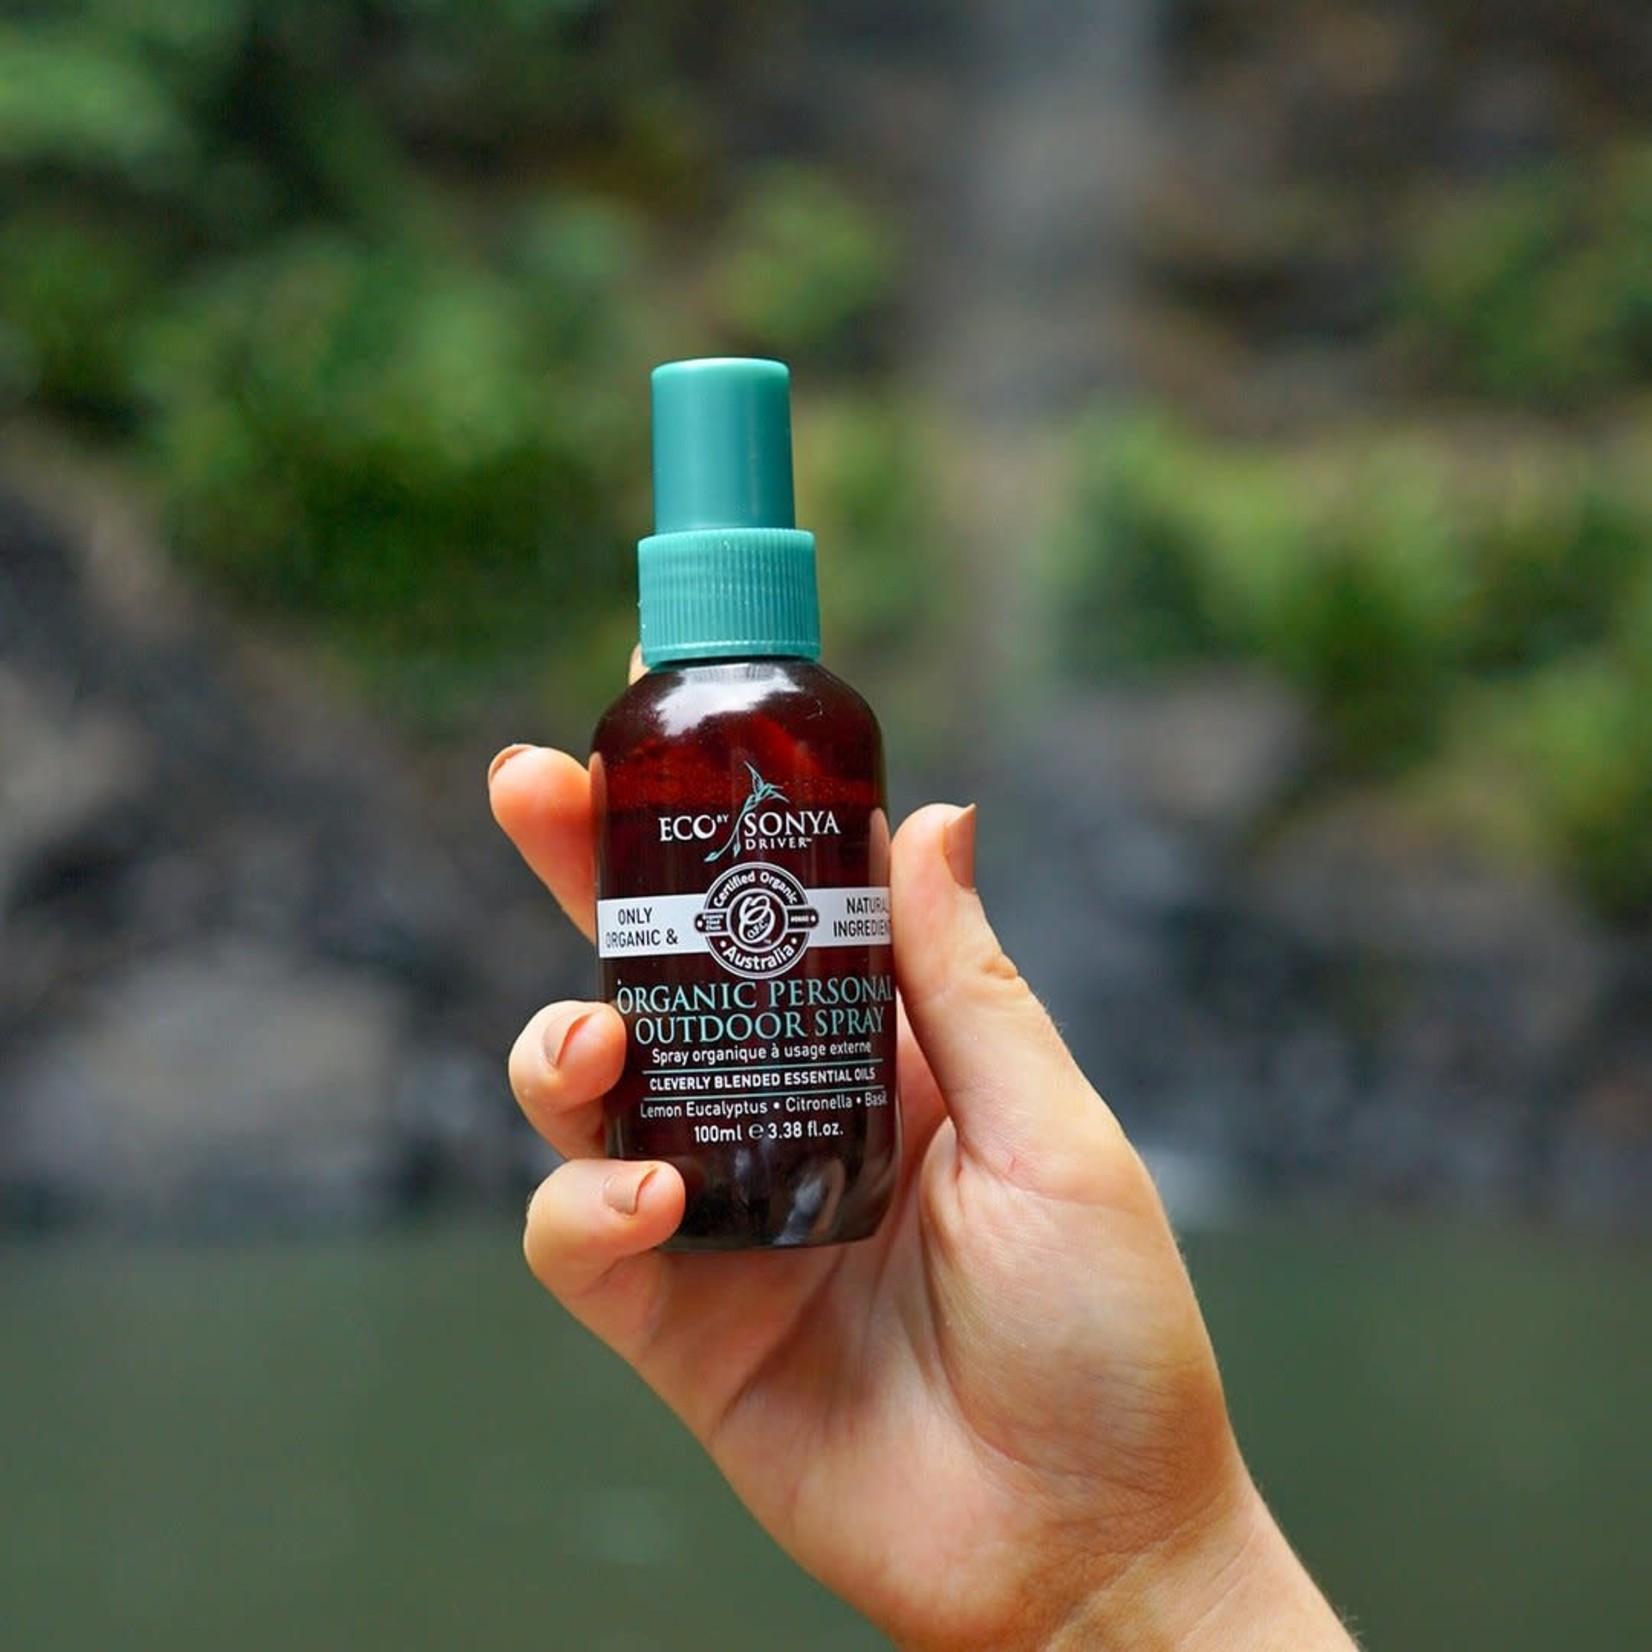 Eco Tan Eco Tan Organic Personal Outdoor Spray 100ml